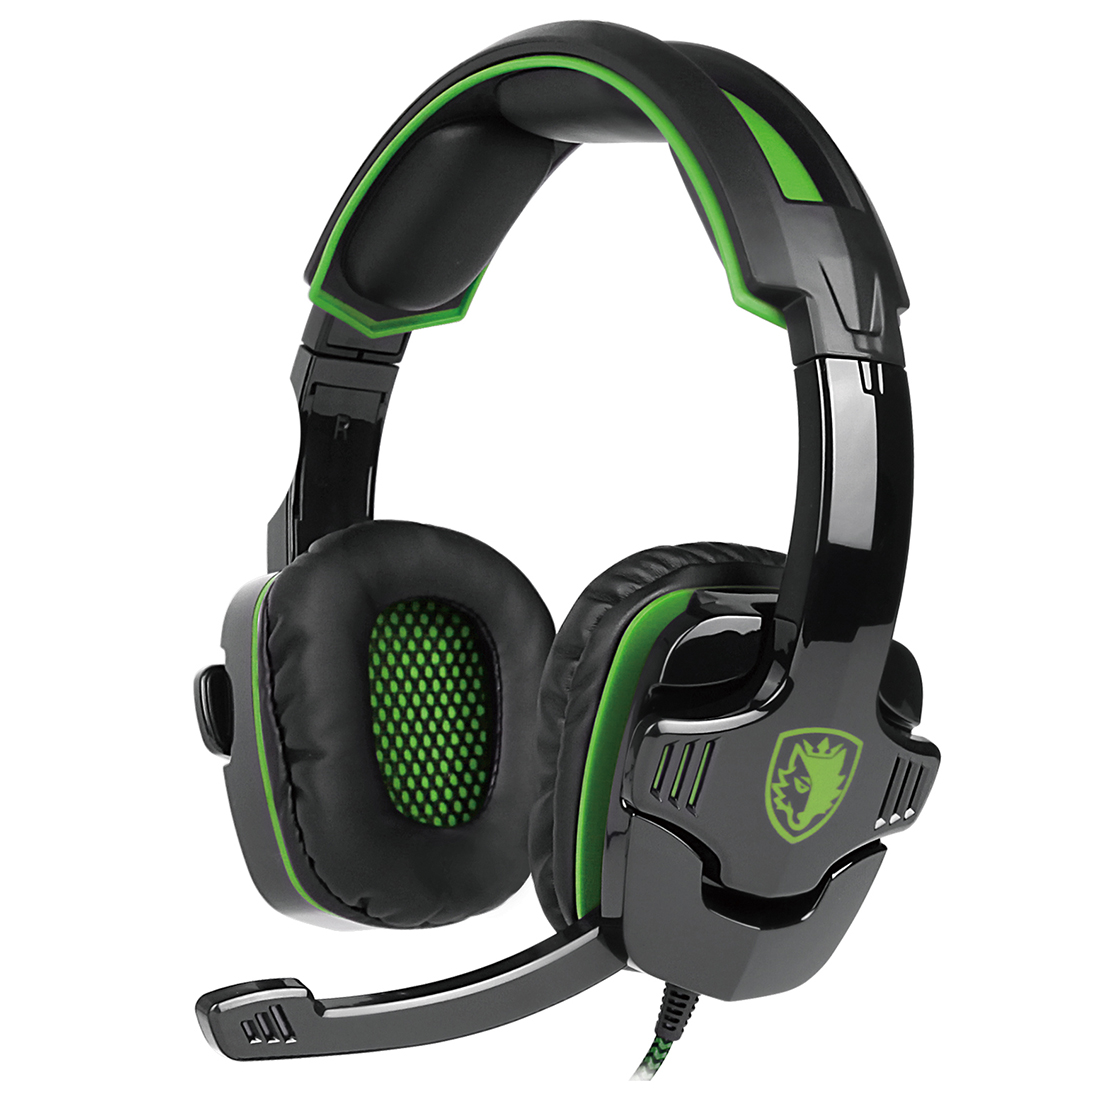 SADES SA-930 Stereo Surround Gaming Headset Headband Mic Headphone tuffstuff ppl 930